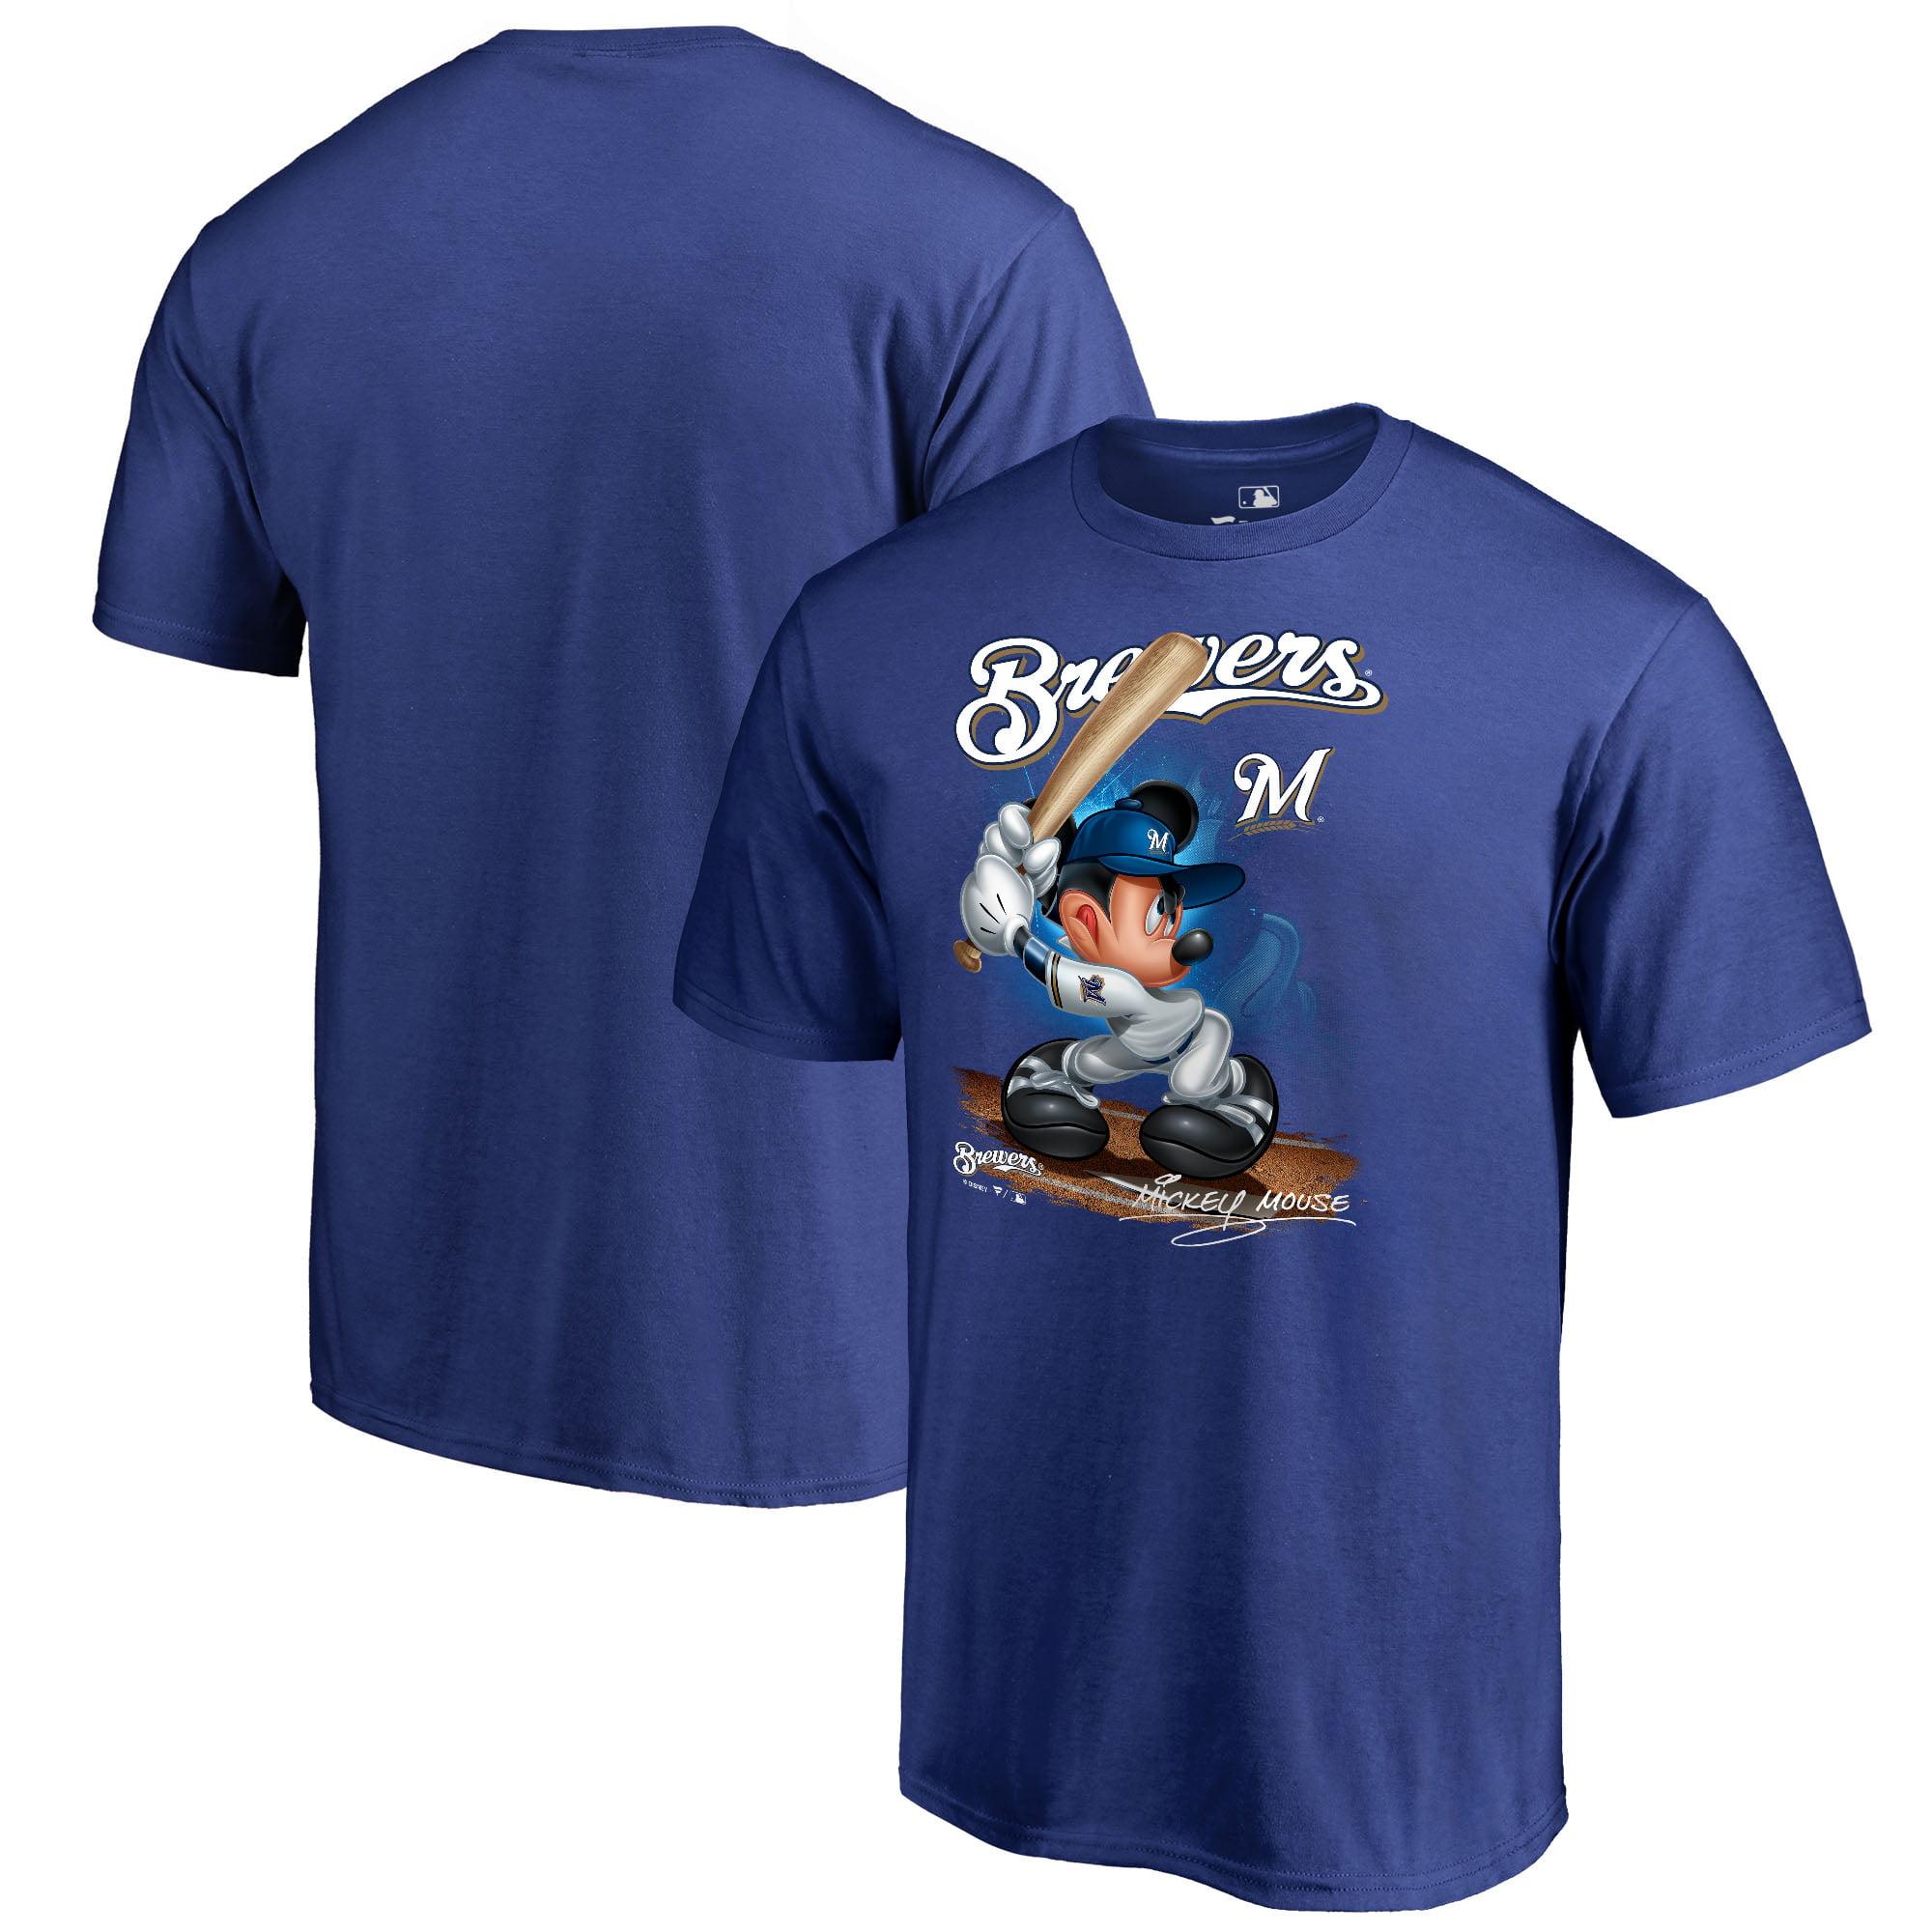 Milwaukee Brewers Fanatics Branded Youth Disney All Star T-Shirt - Royal